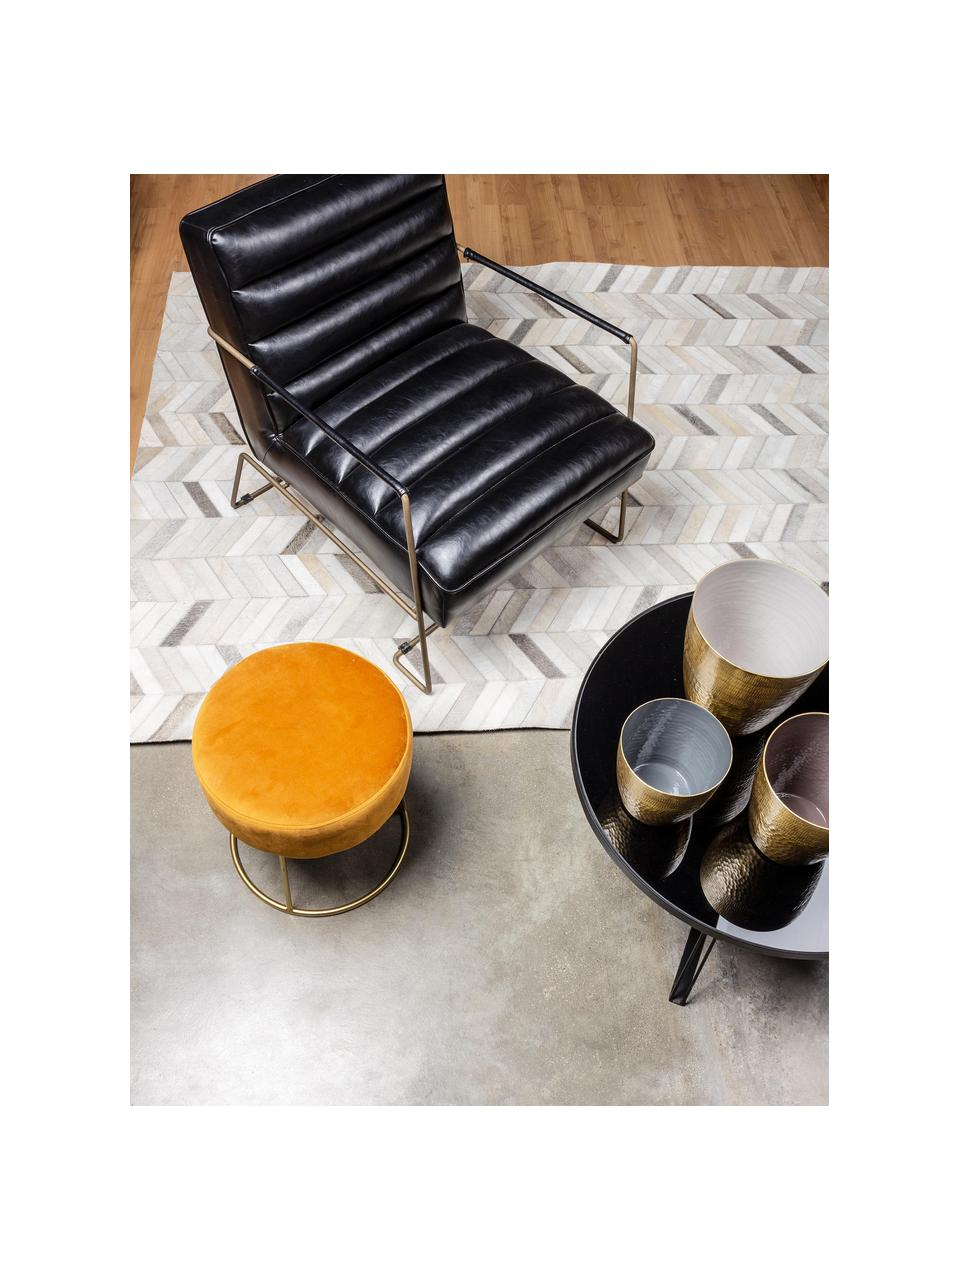 Fotel ze sztucznej skóry Brianna, Tapicerka: sztuczna skóra, Nogi: metal epoksydowany, Czarny, S 63 x G 74 cm